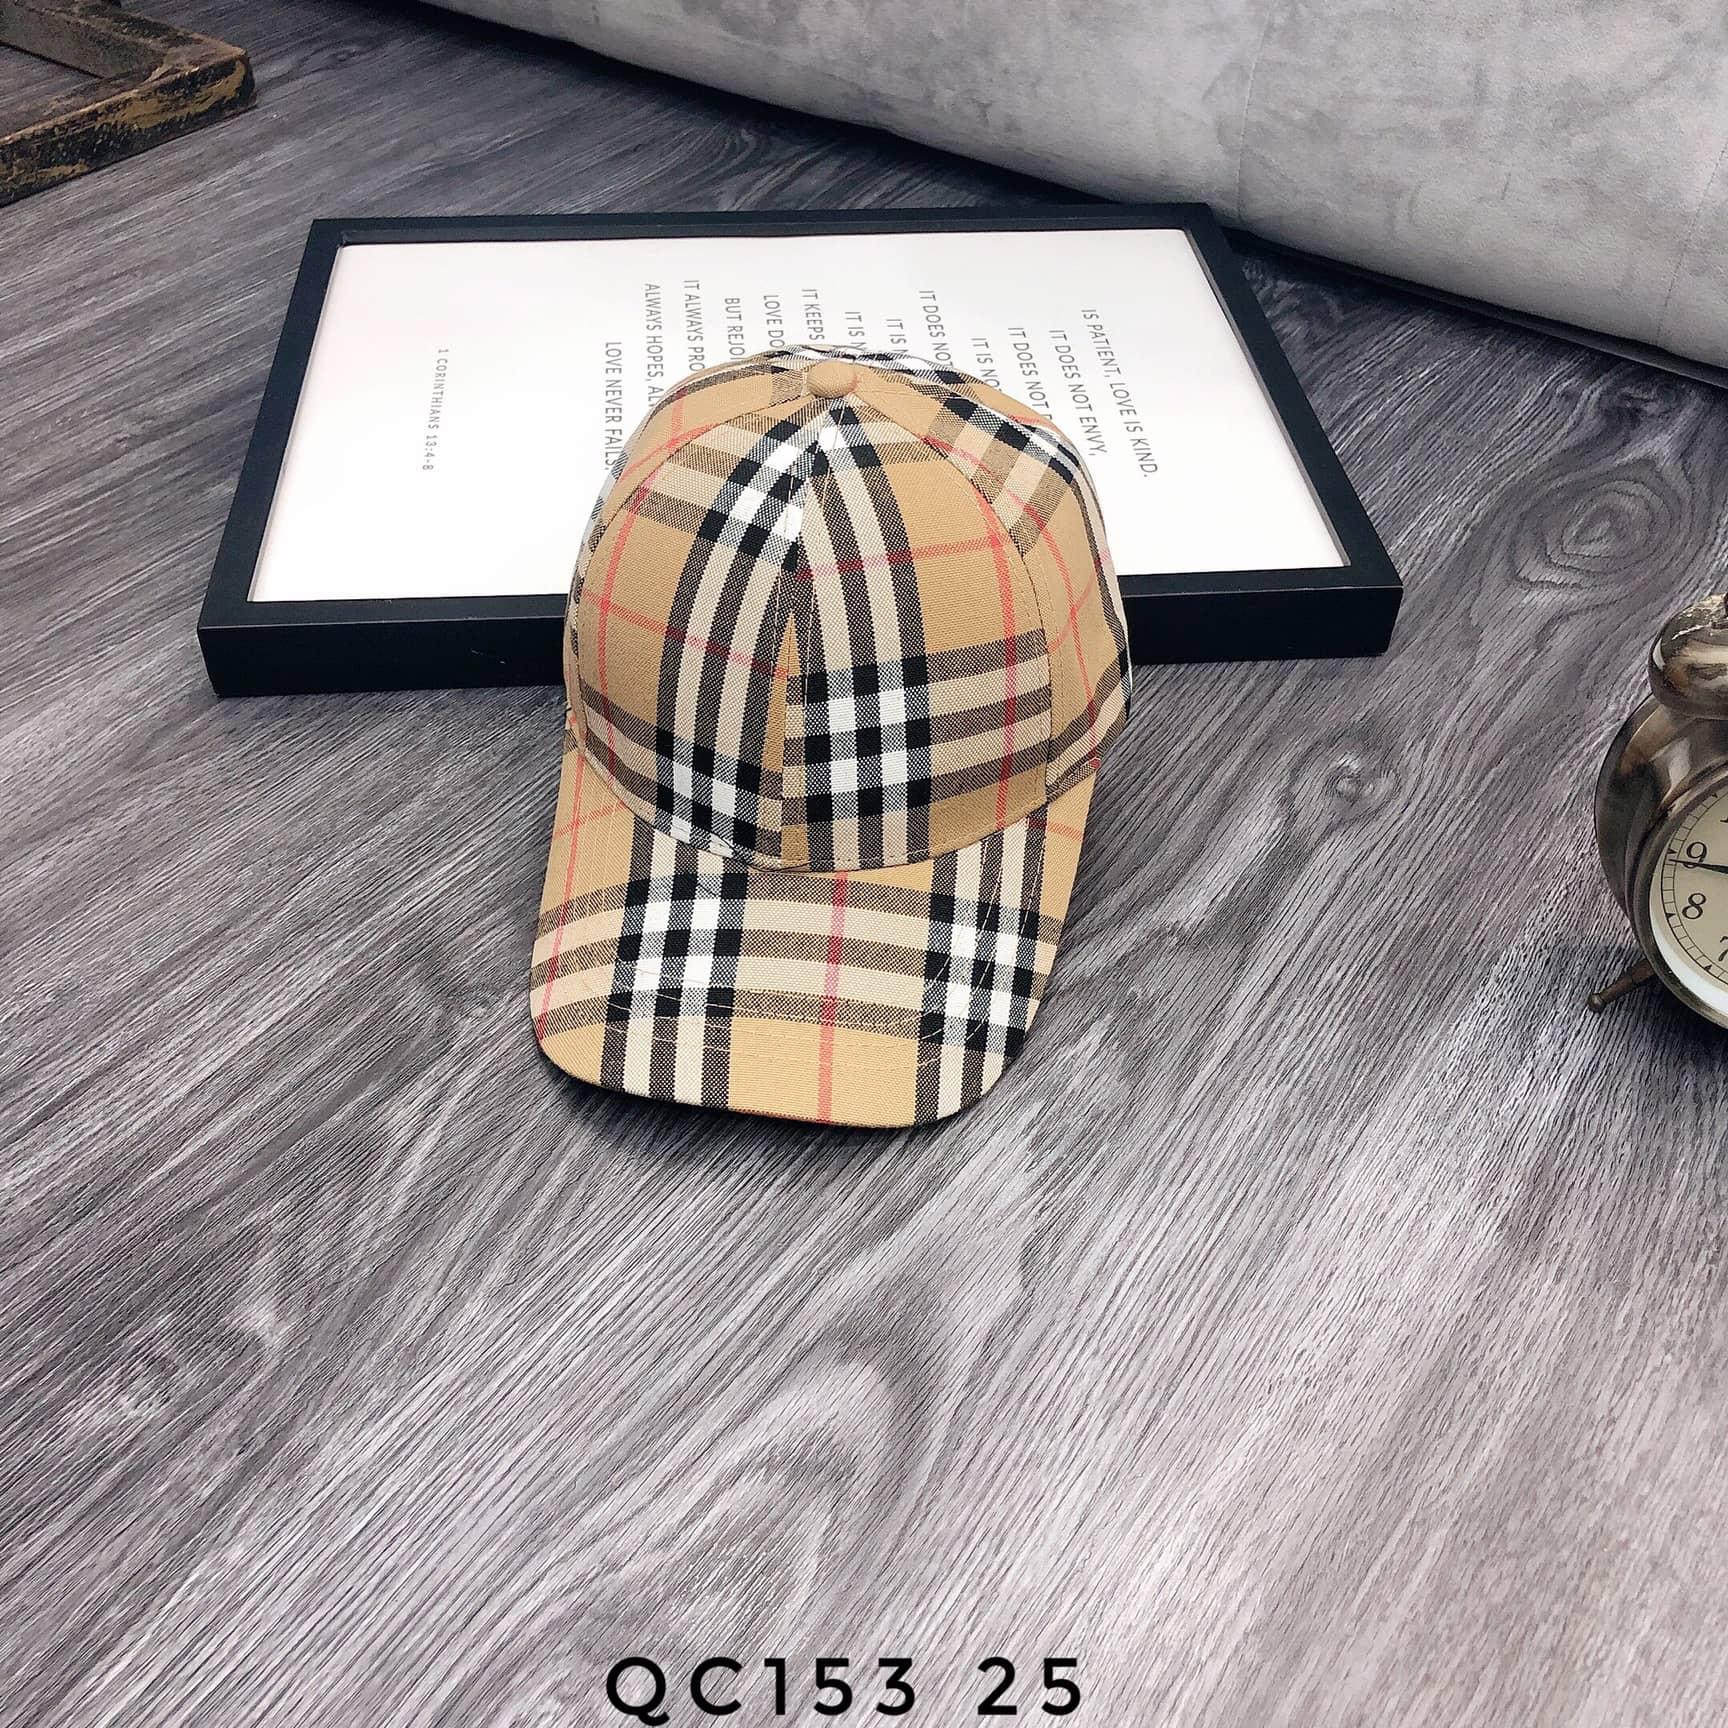 NÓN QC153